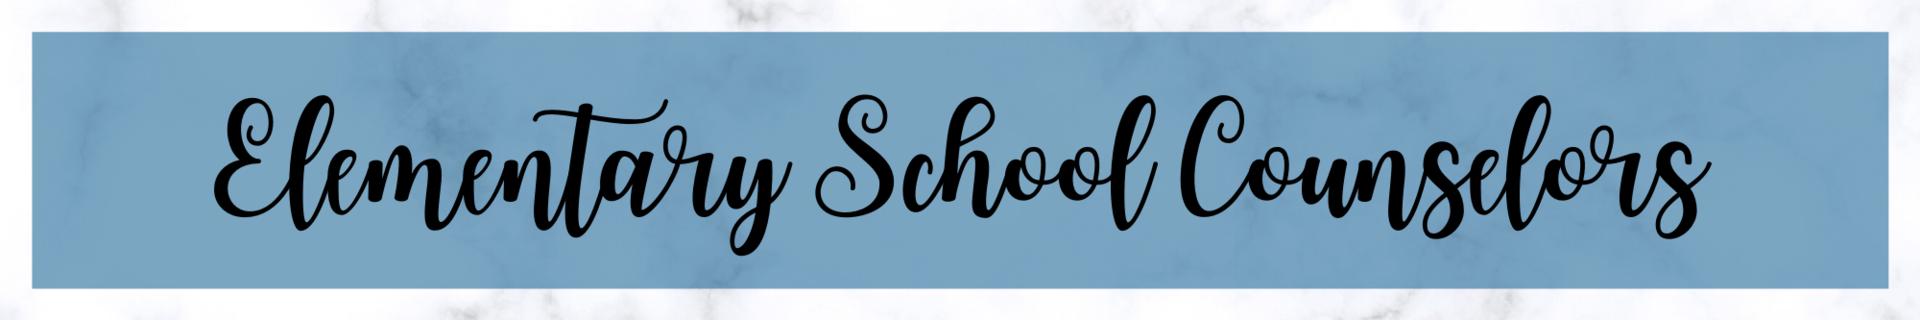 Elementary School Counselor header